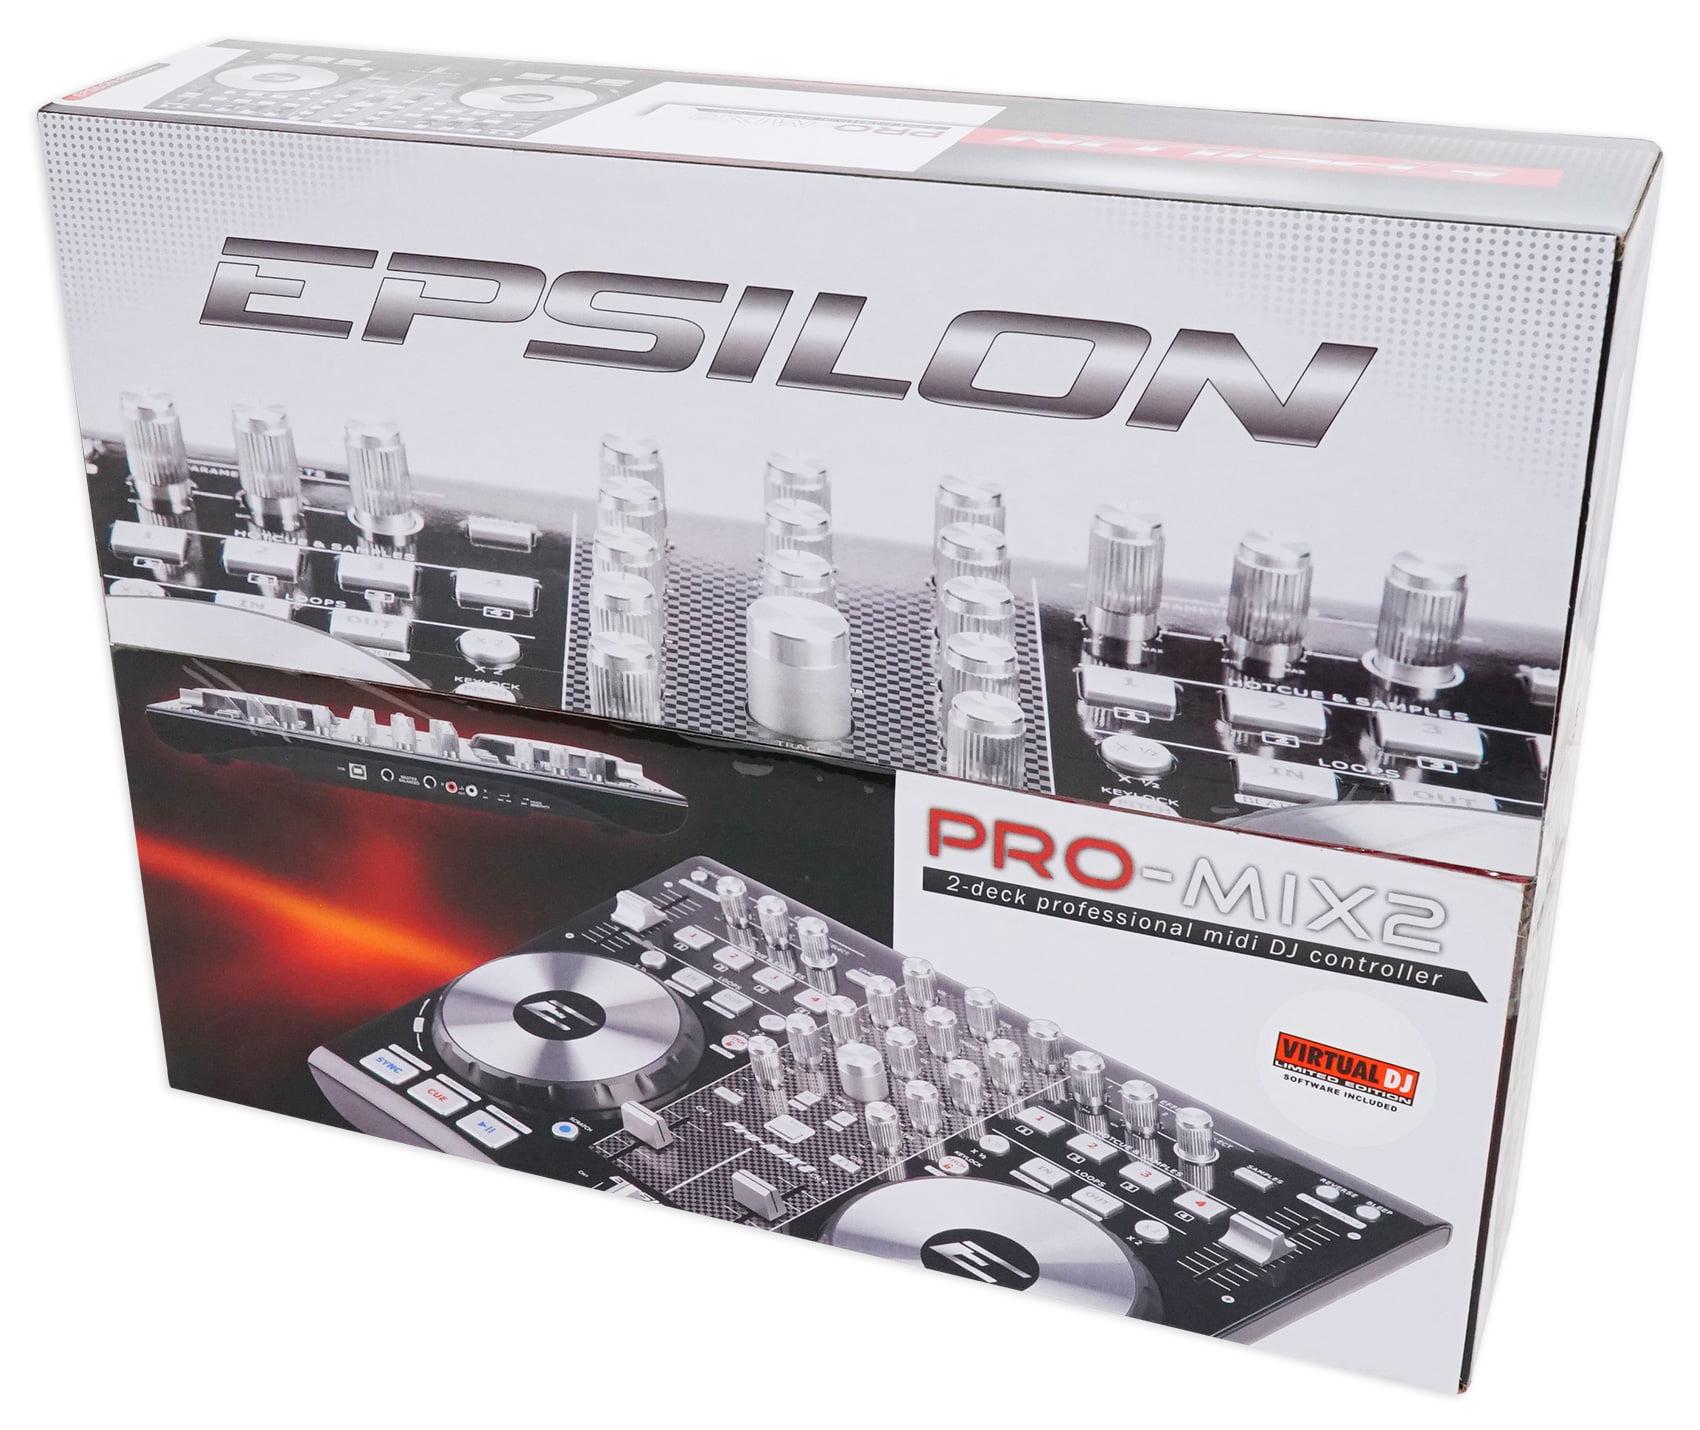 EPSILON PRO-MIX2 MIDI USB DJ Controller+Virtual DJ Software w/Soundcard +  Stand